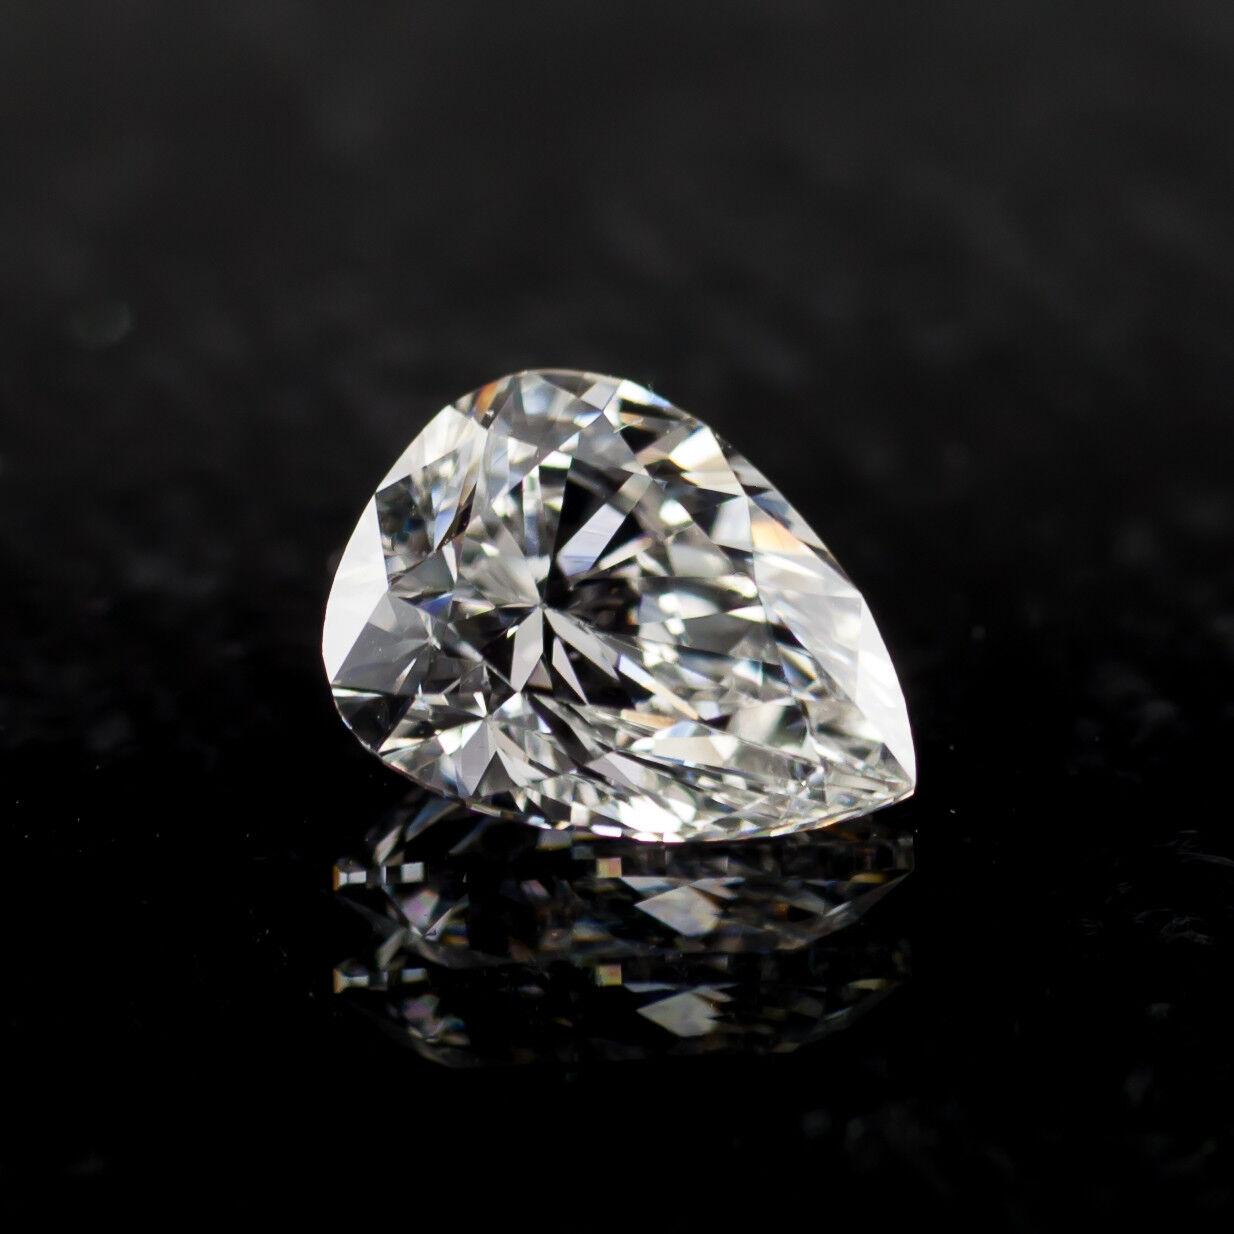 1.12 Carat Loose G / VS2 Pear Shaped Cut Diamond GIA Certified